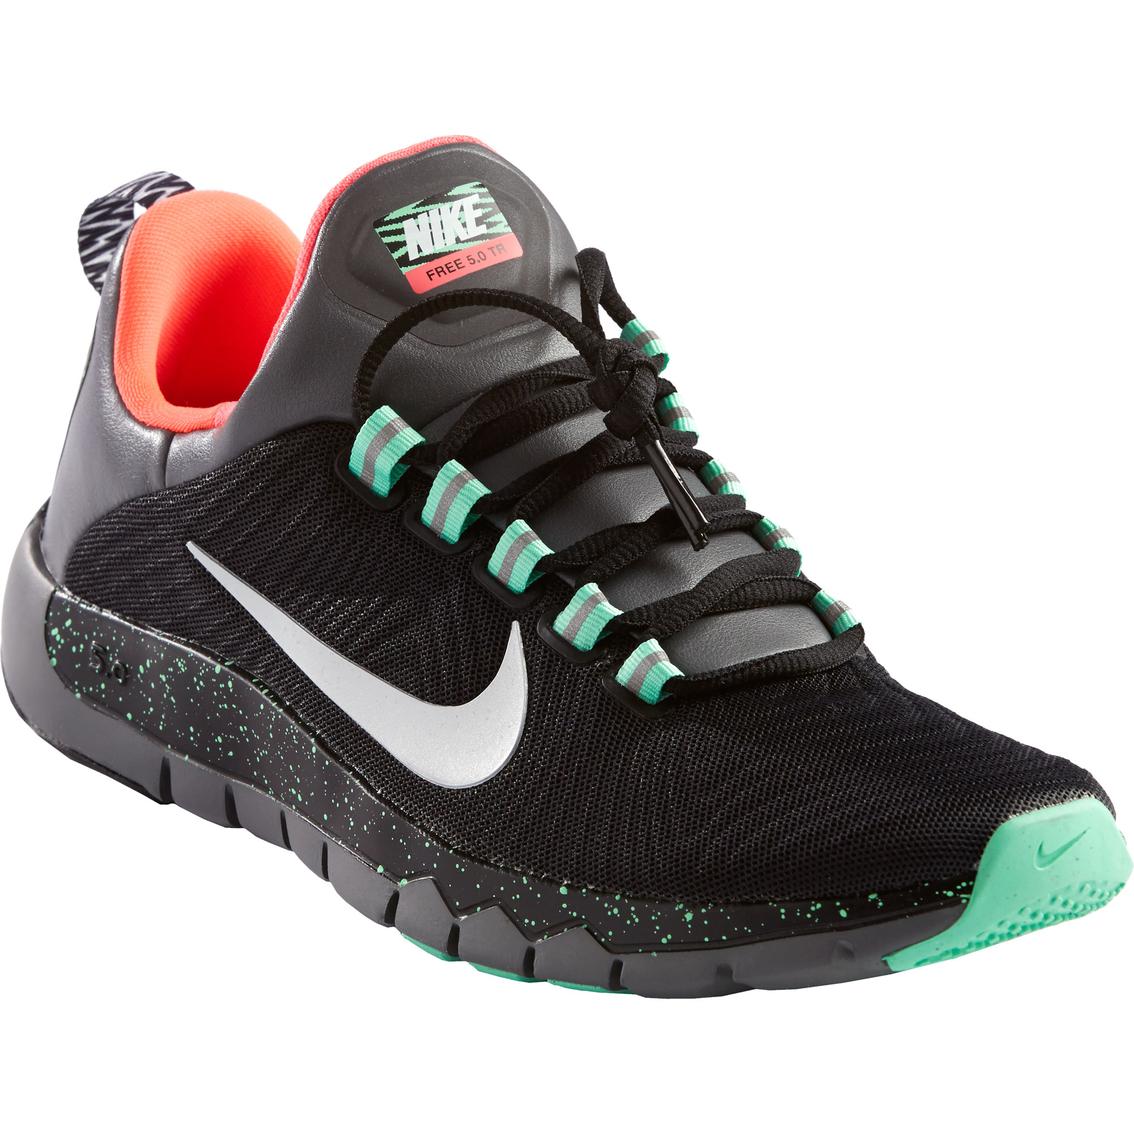 on sale 44452 73494 Nike Mens Free Trainer 5.0 NRG Training Shoes